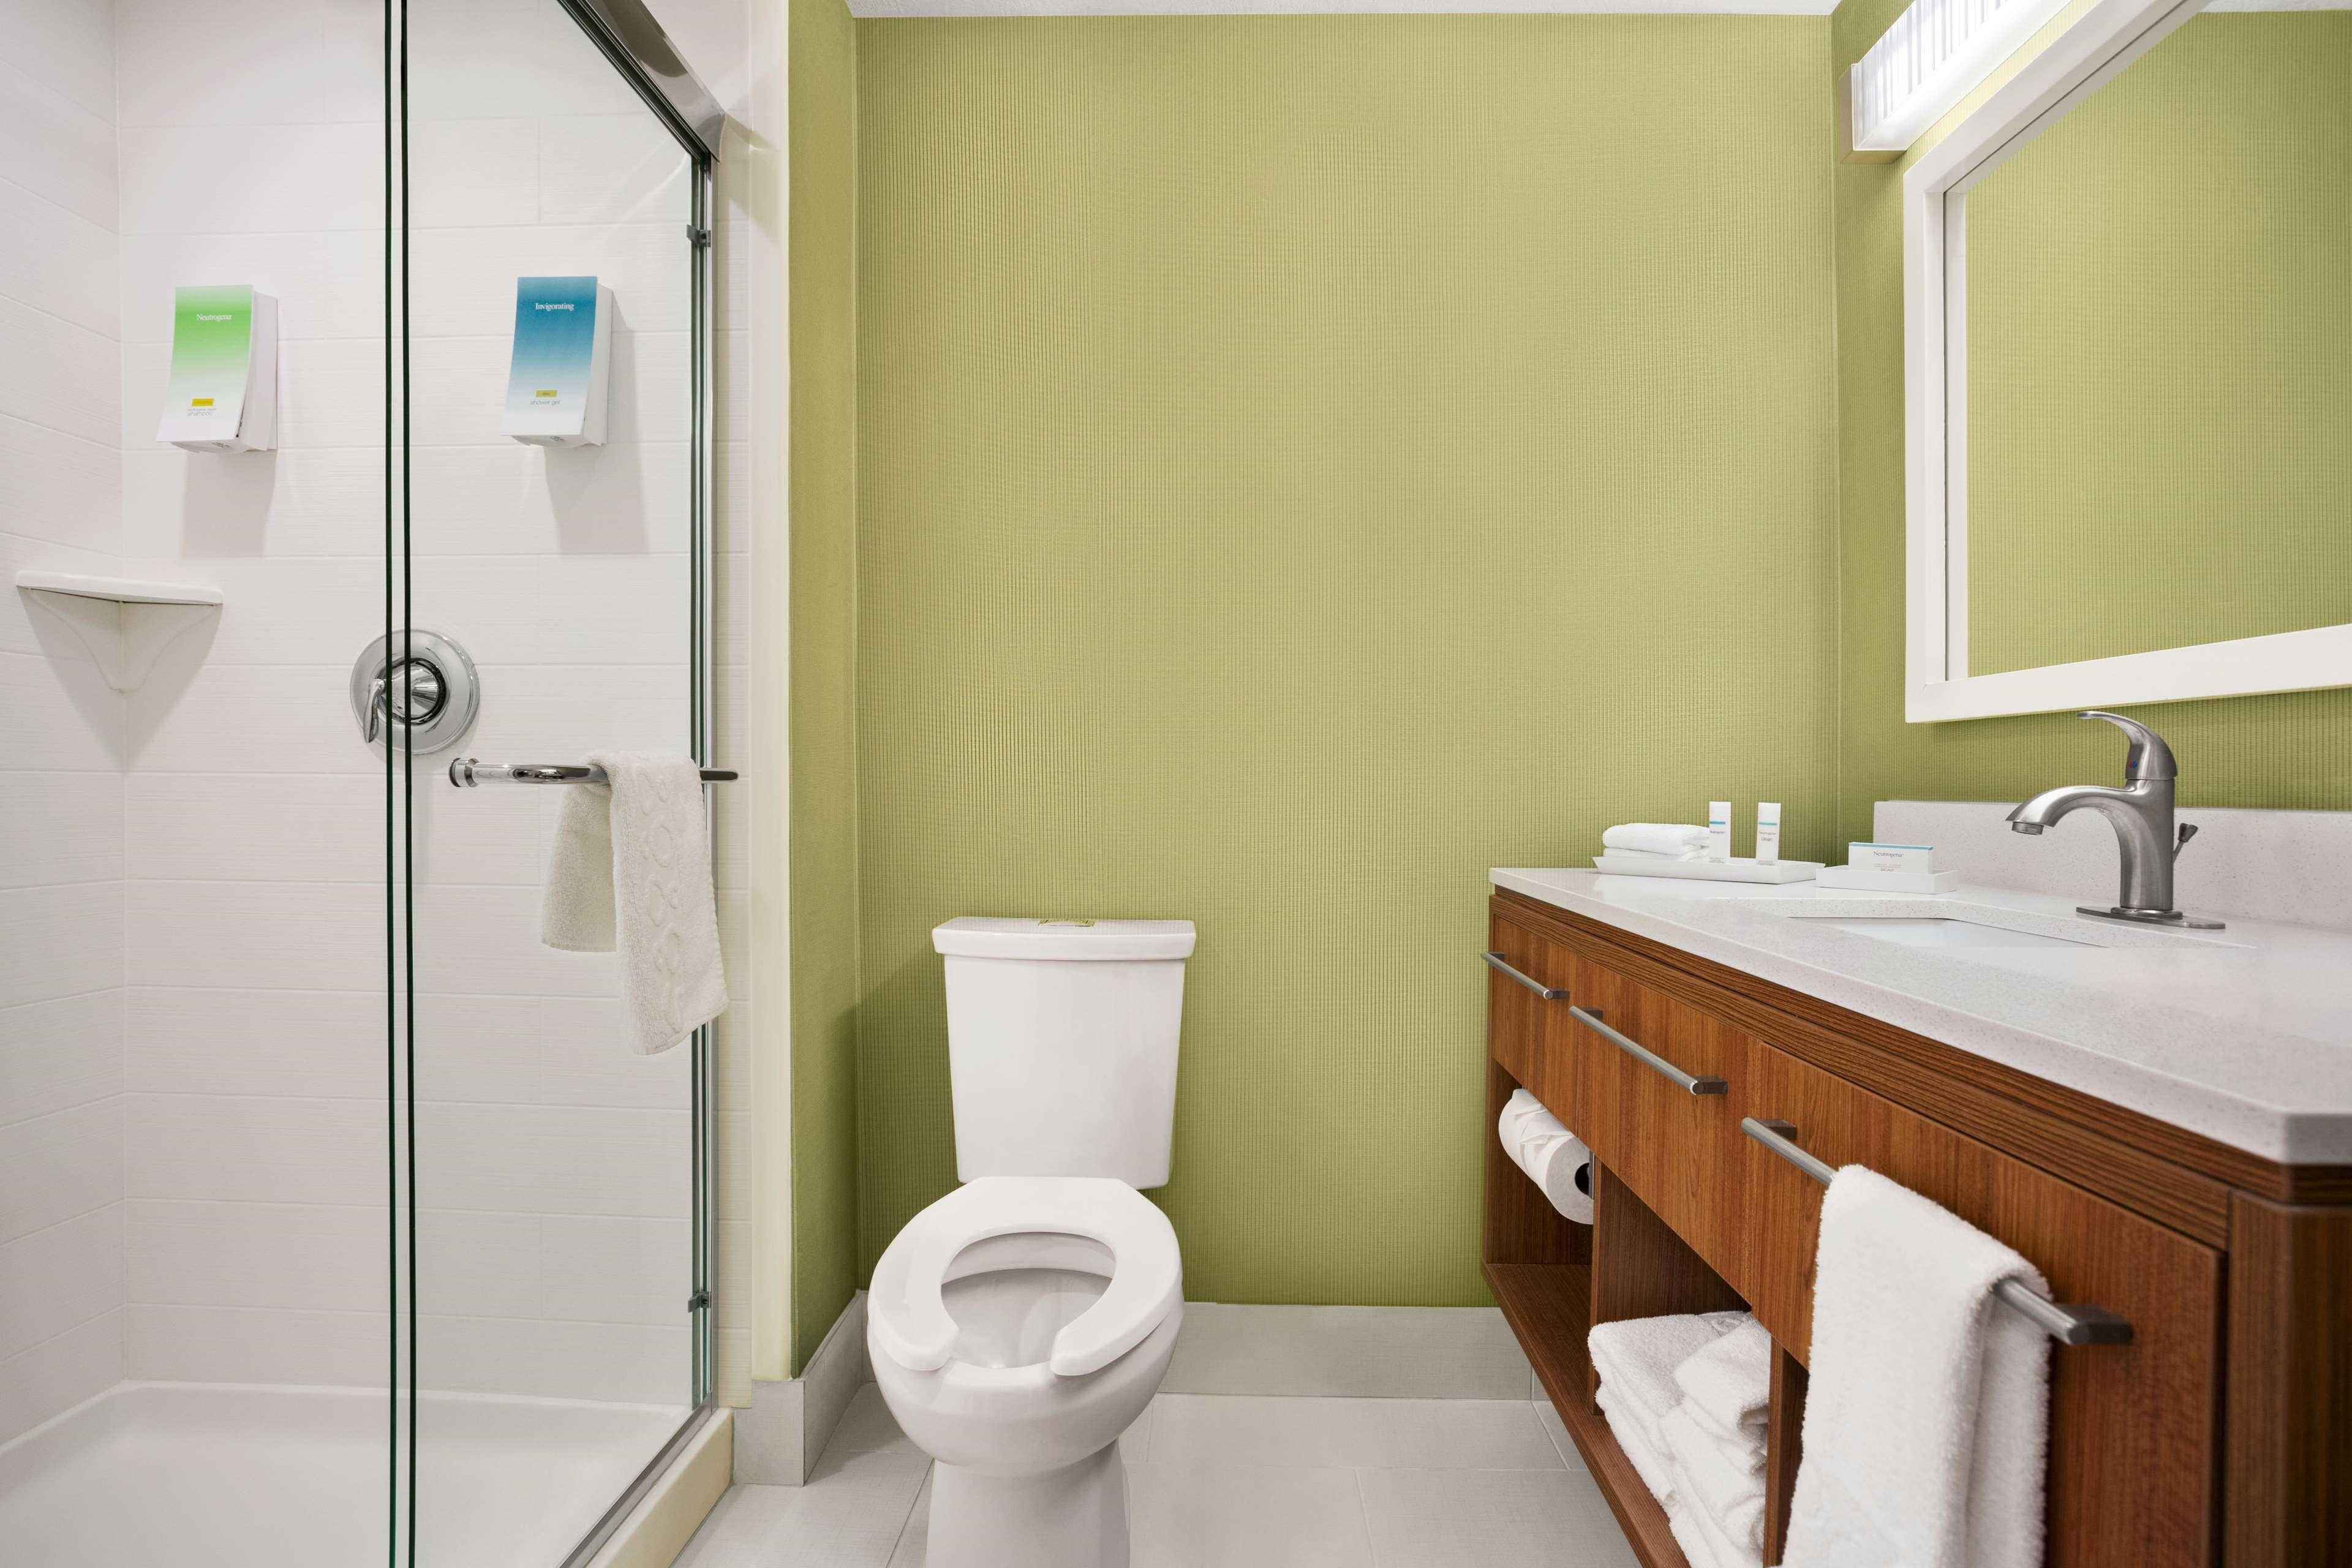 Home2 Suites by Hilton Elko image 16